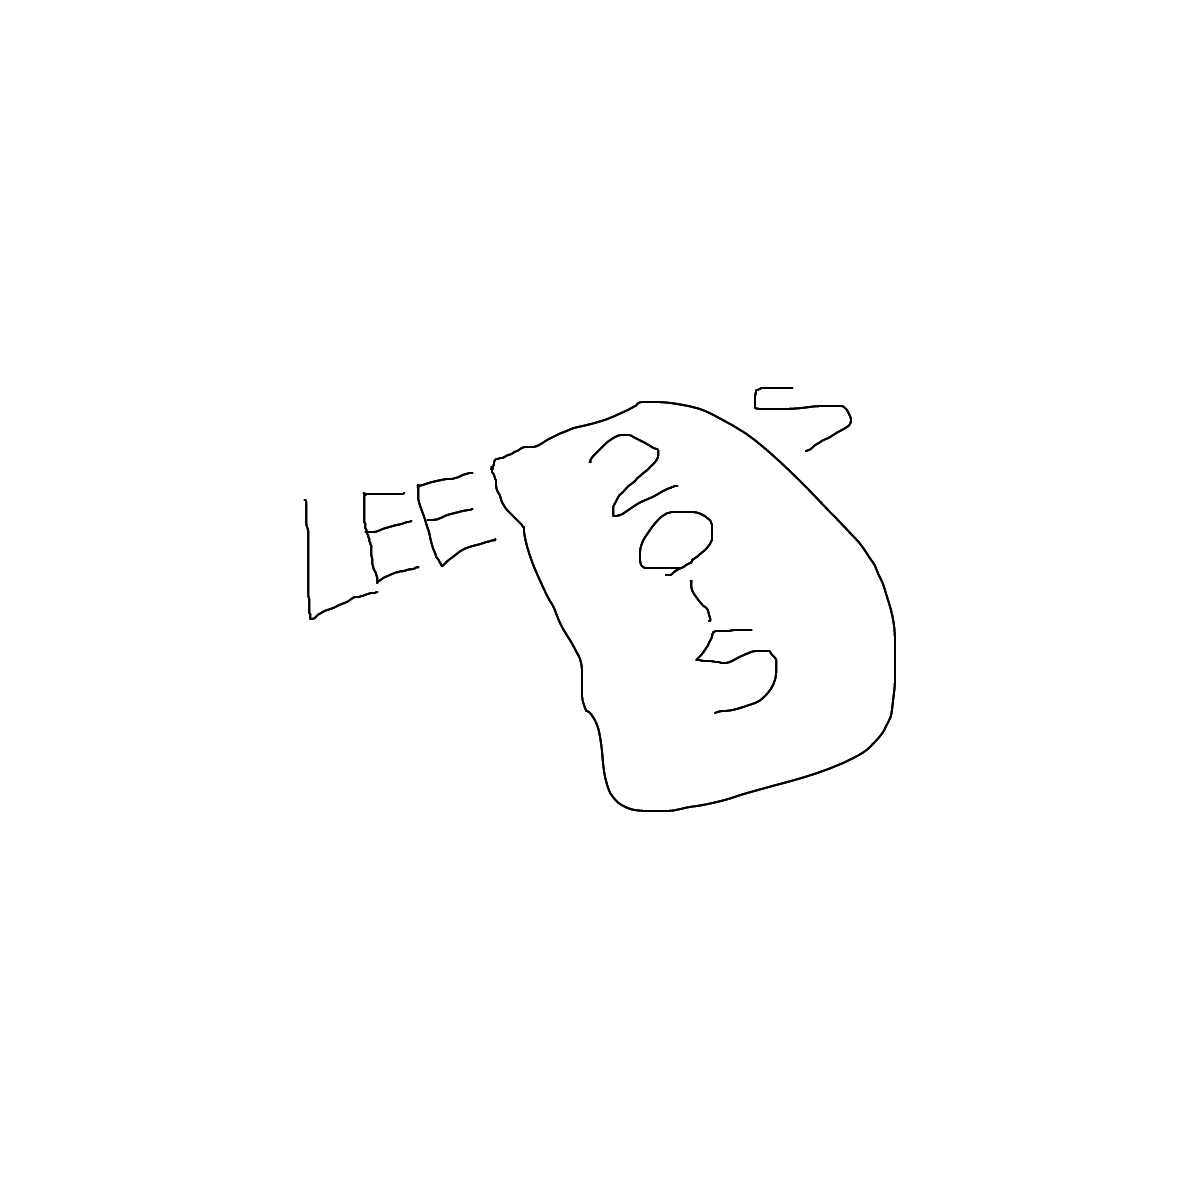 BAAAM drawing#2754 lat:53.8004379272460940lng: -1.5558649301528930